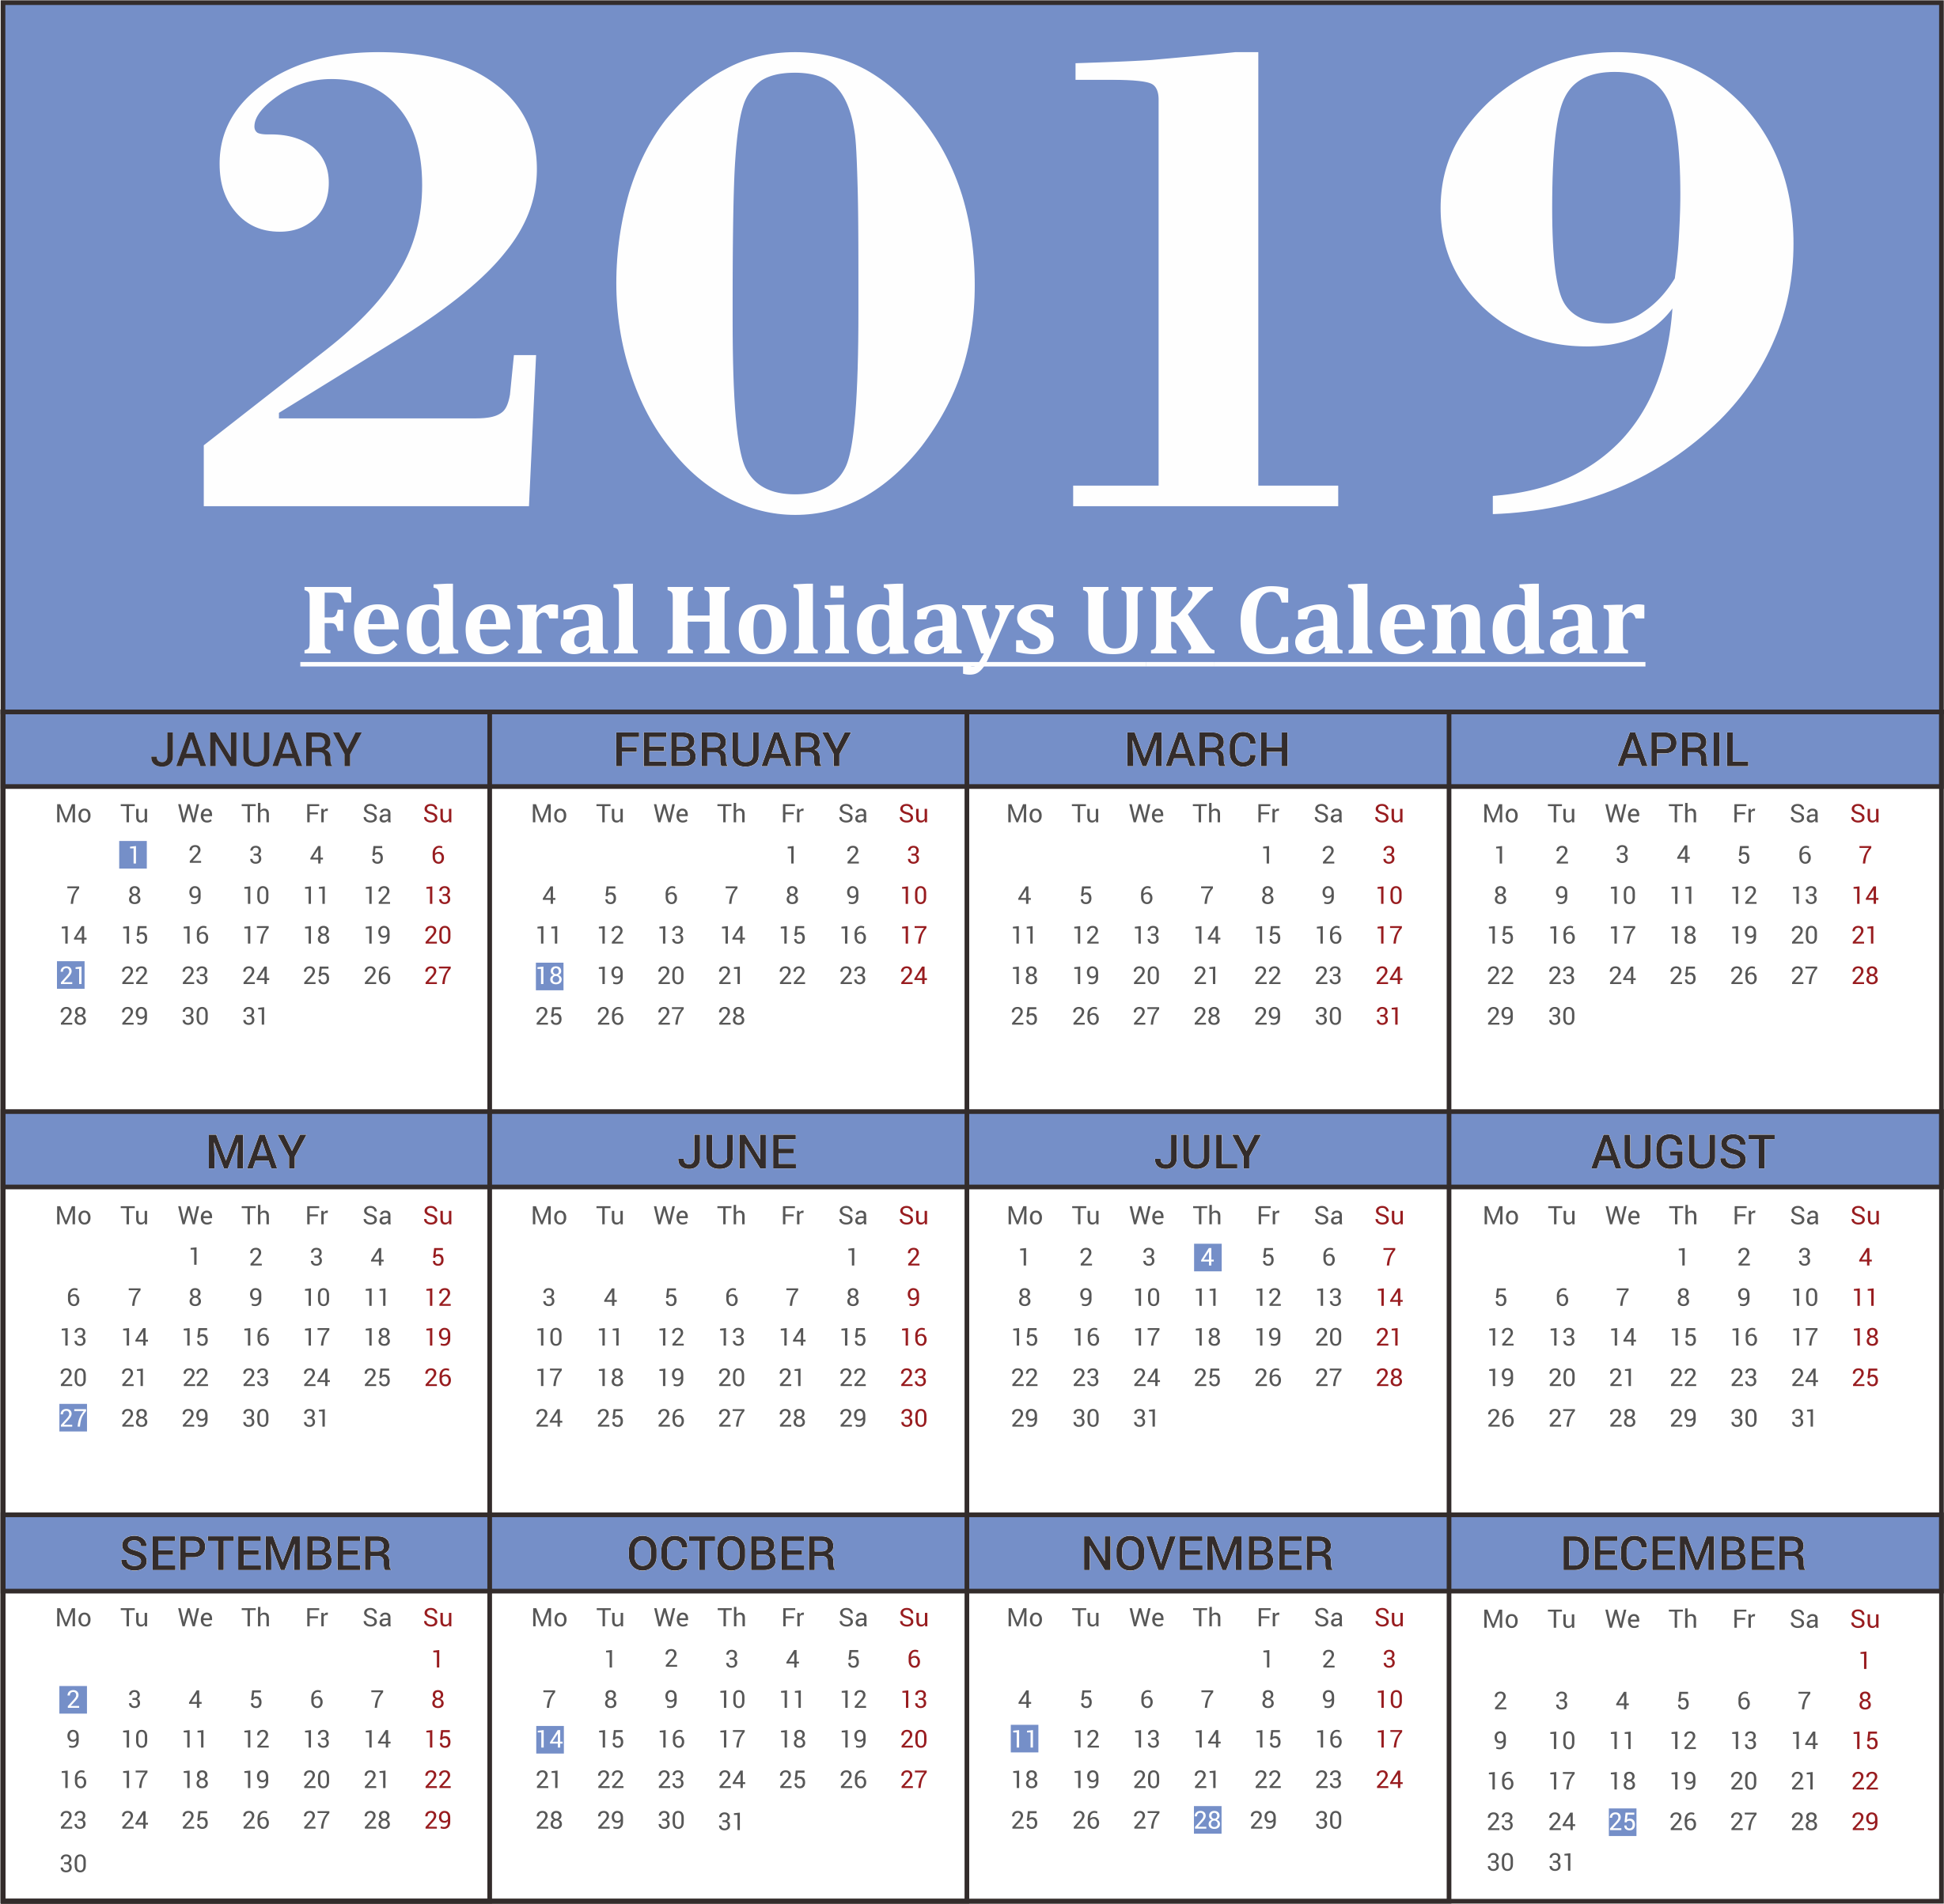 UK Federal 2019 Holiday Calendar